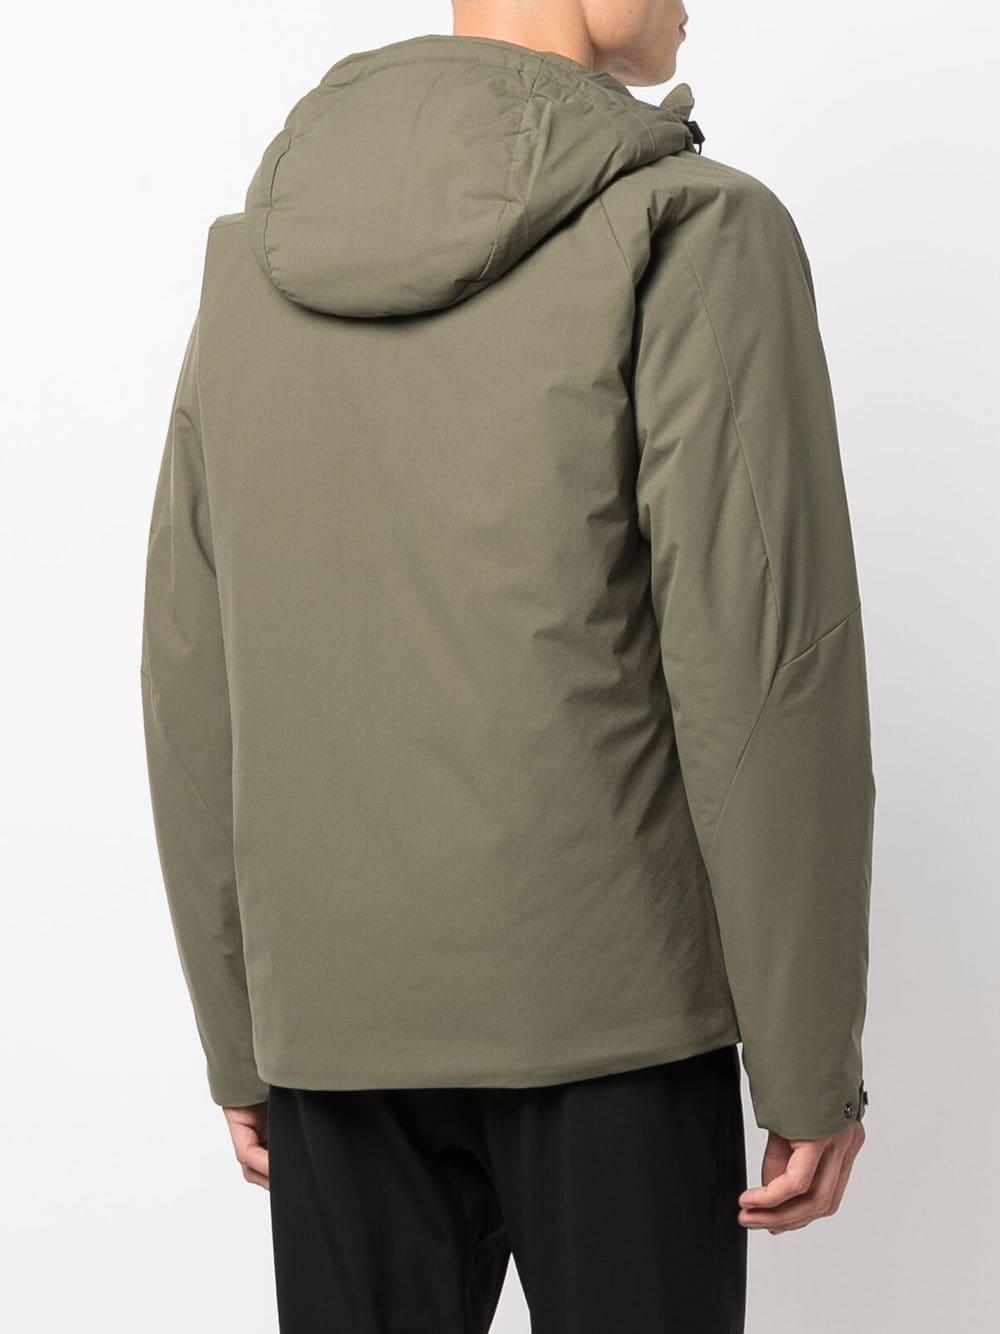 giacca leggera pro tek uomo grigia C.P. COMPANY | Giacche | 11CMOW025A004117A665